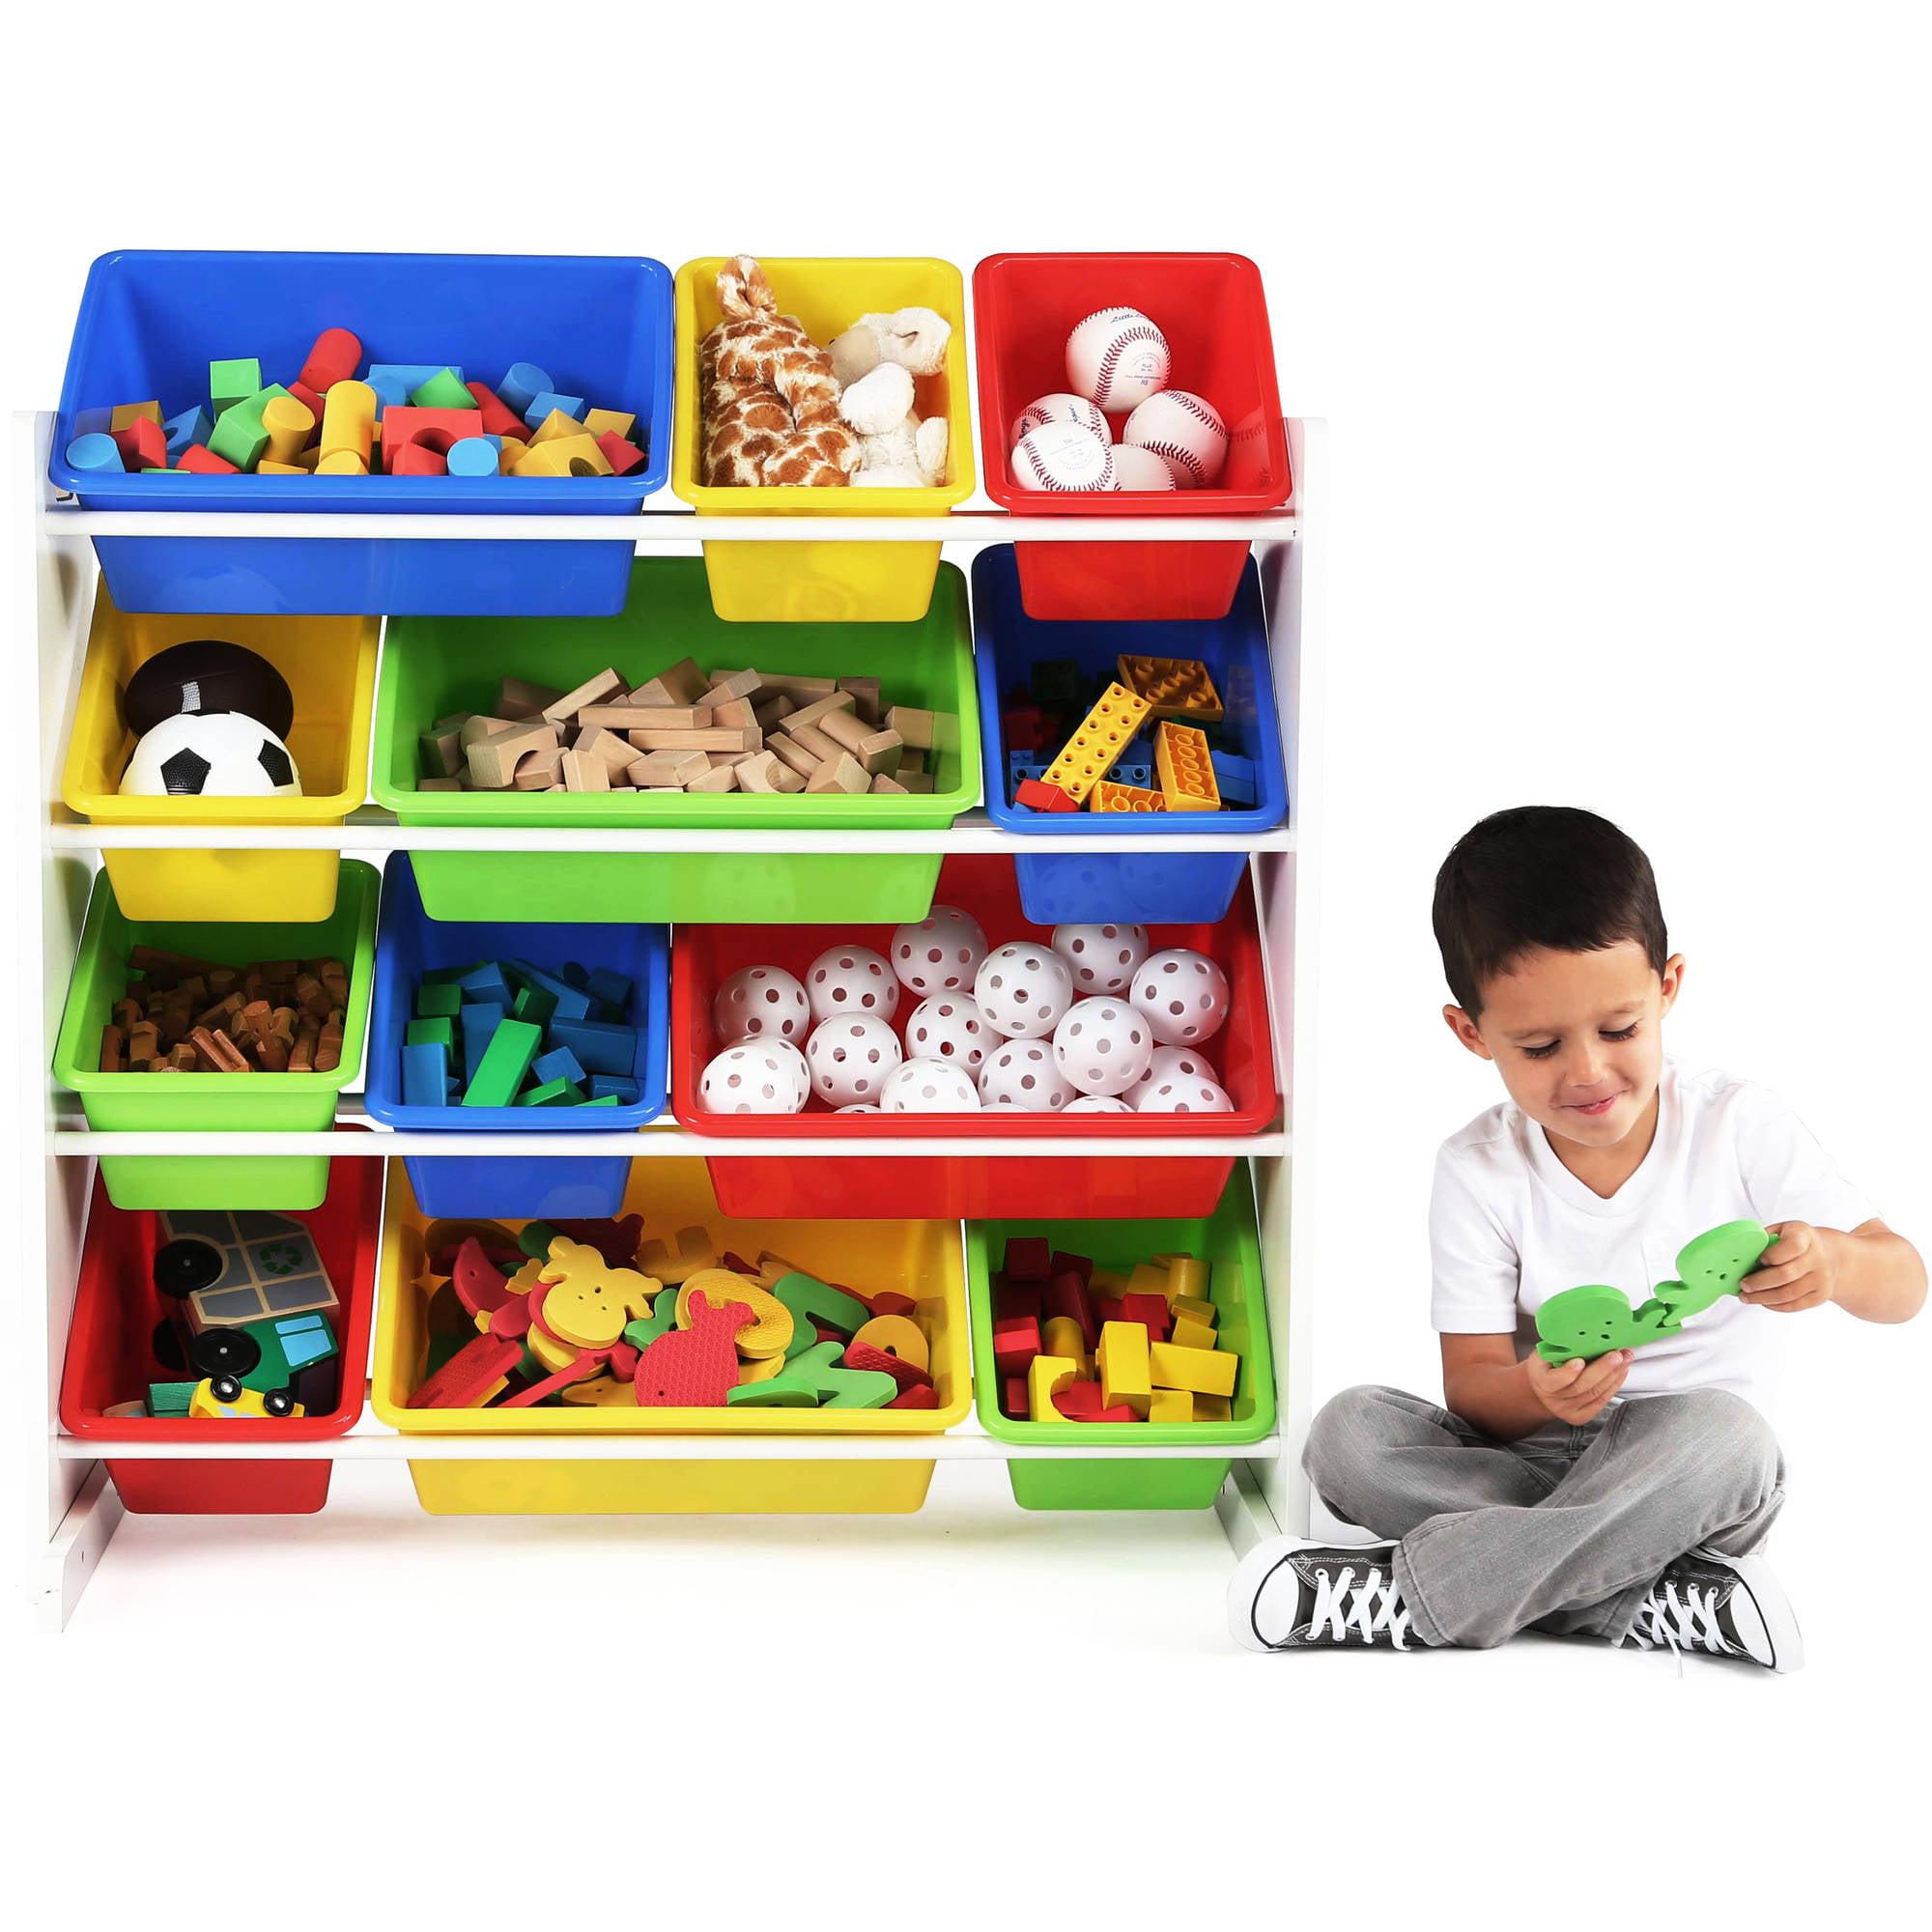 Tot Tutors Kids Toy Storage Organizer With 12 Plastic Bins, Multiple Colors    Walmart.com